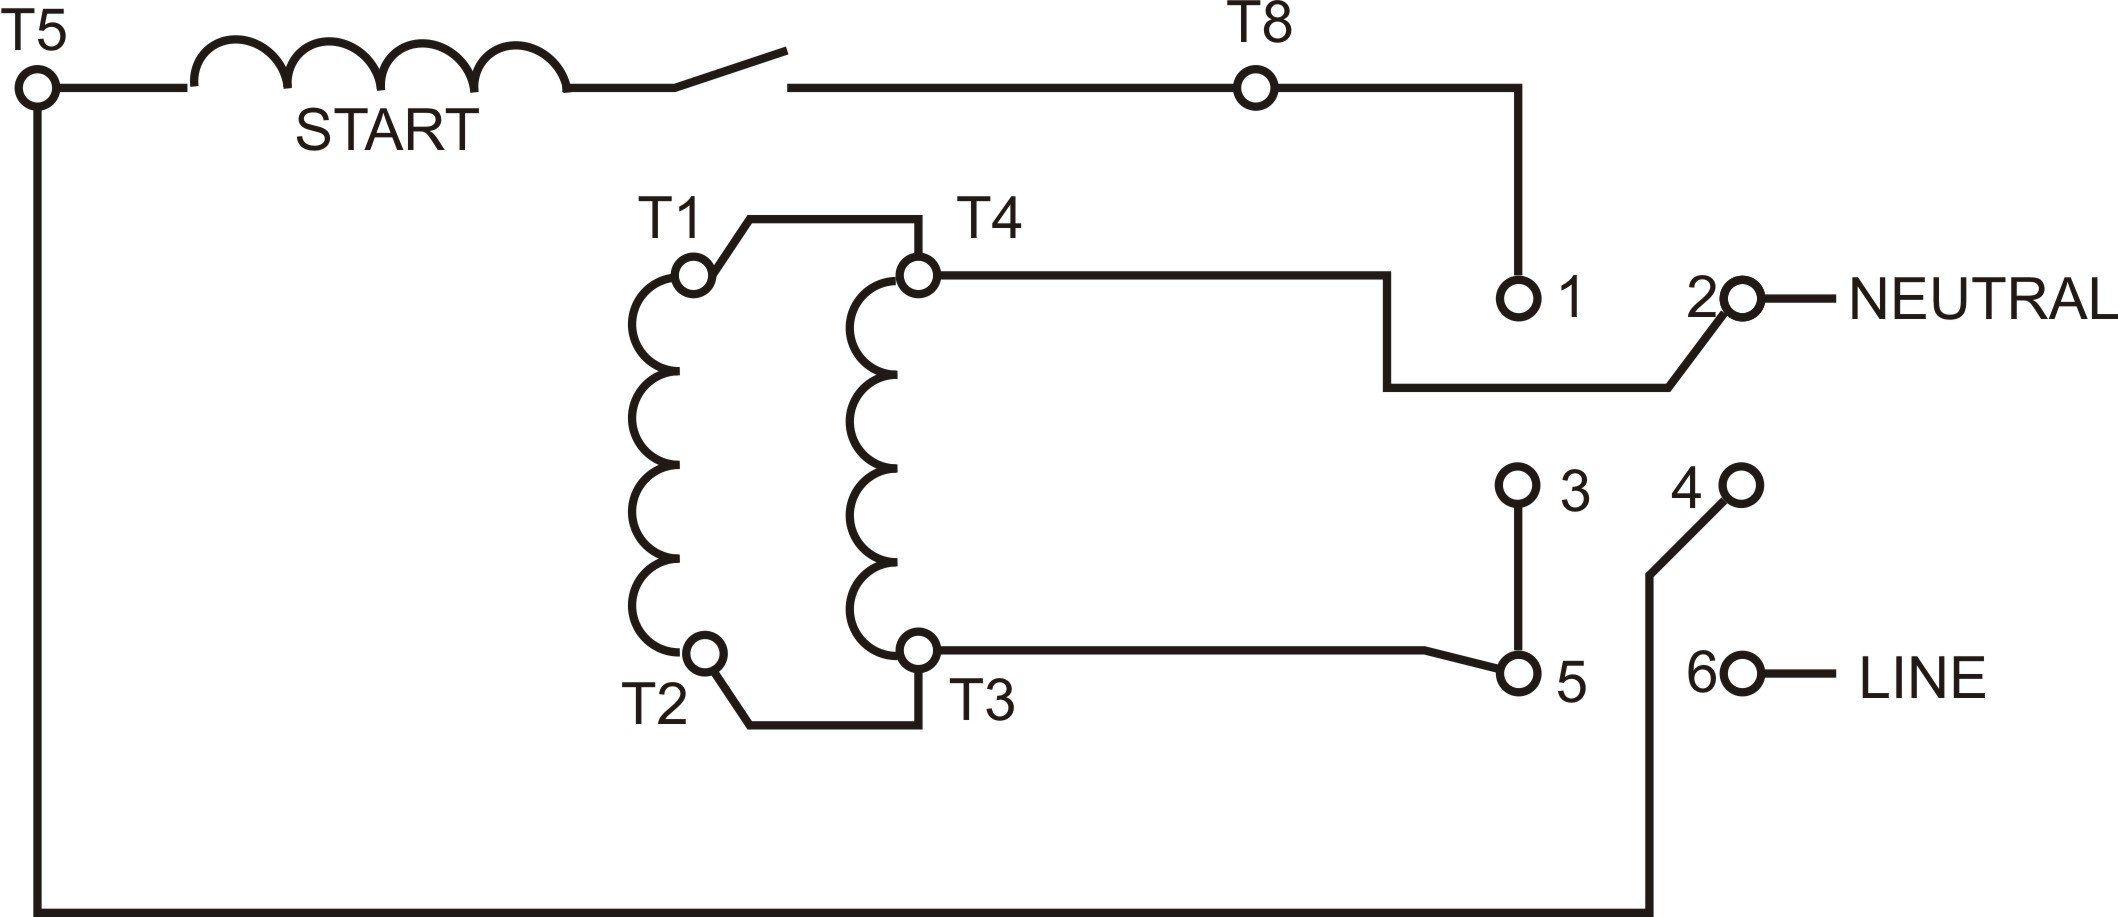 19 Electric Motor Switch Wiring Diagram References Electric Motor Electricity Diagram